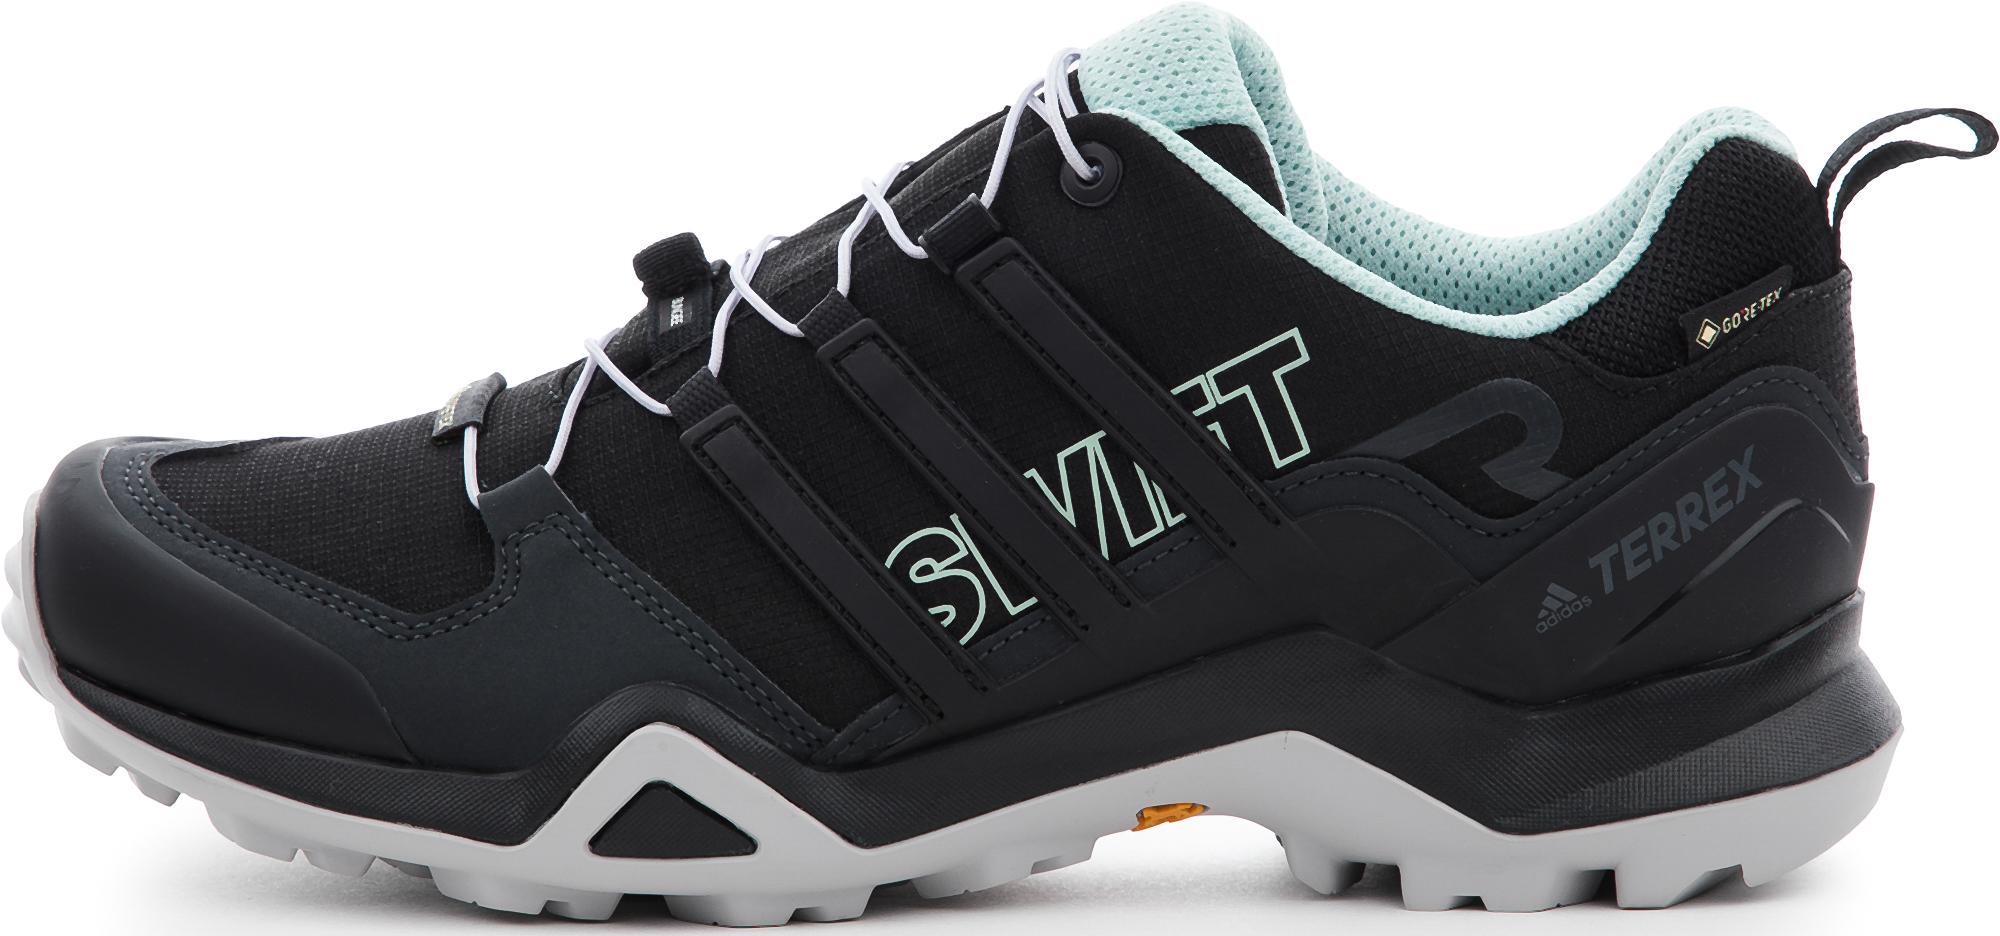 Adidas Полуботинки женские Terrex R2 GTX, размер 40